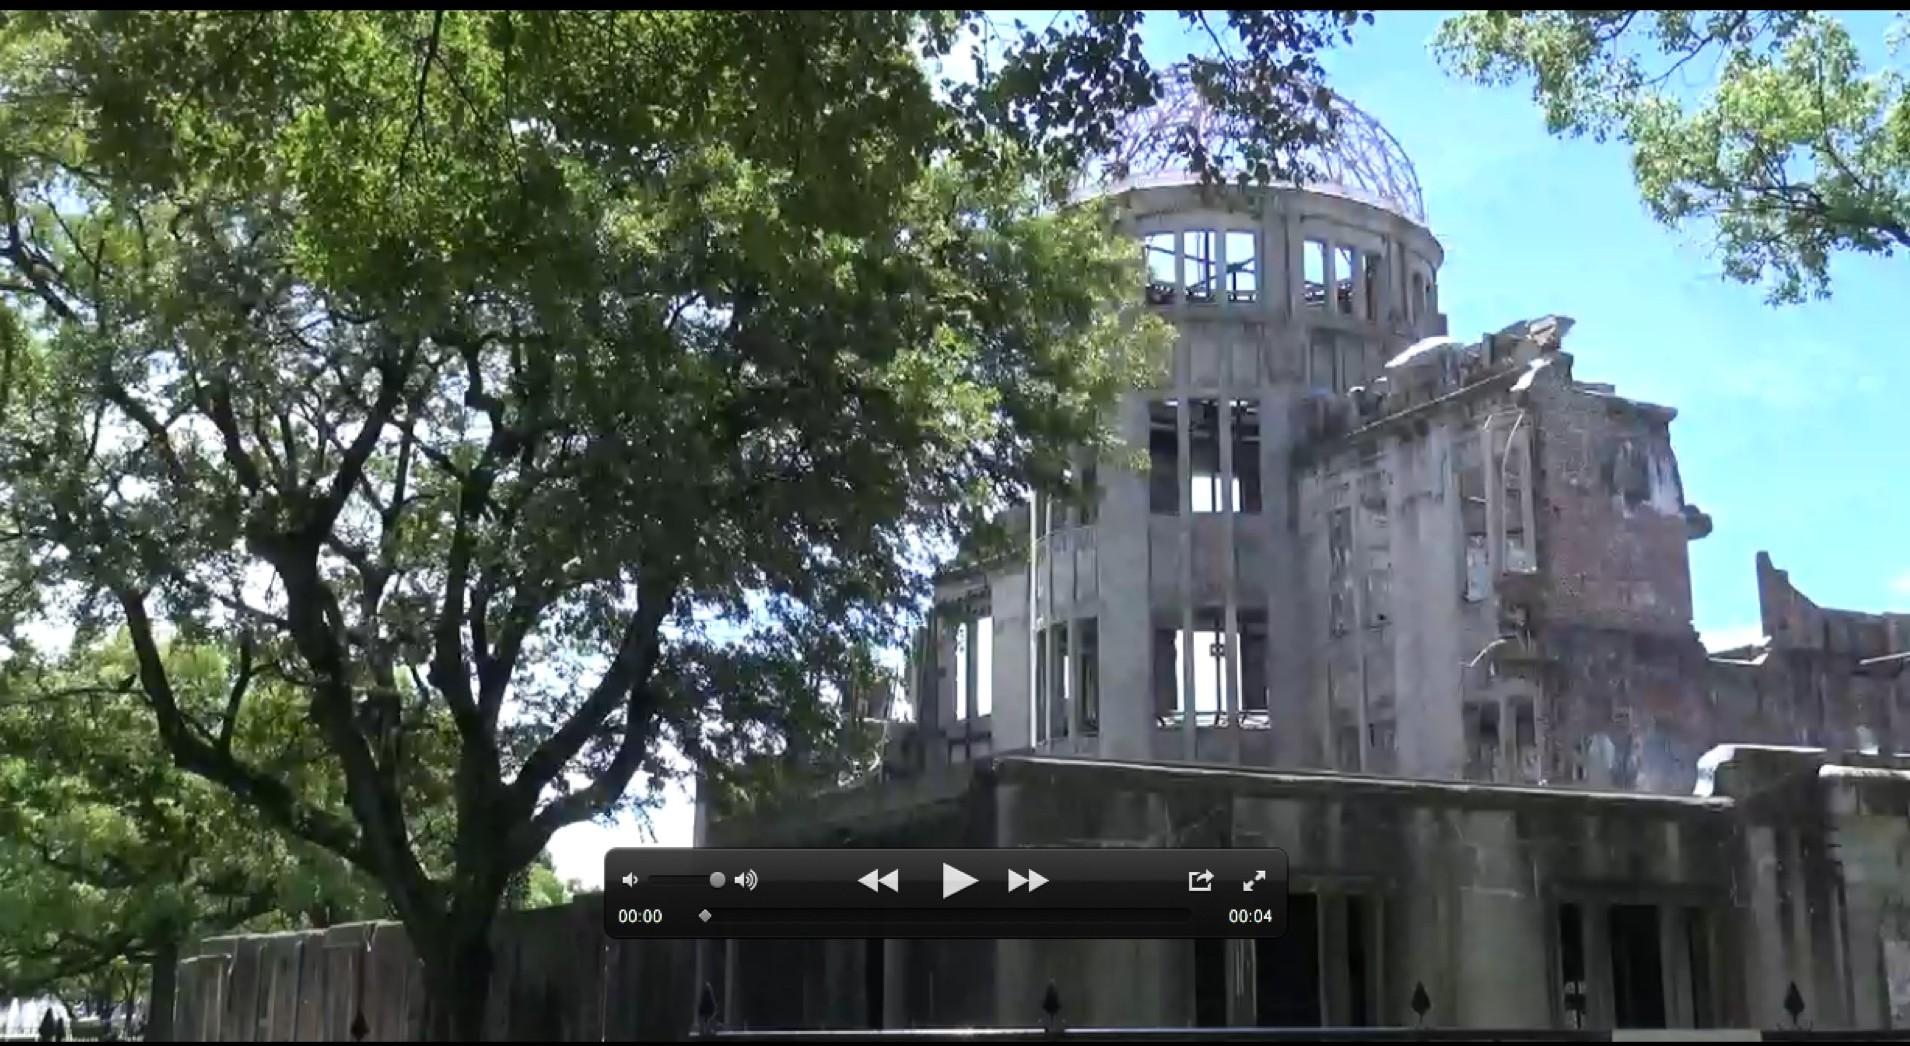 Gedenkstätte A-Bomb Dome Hiroshima